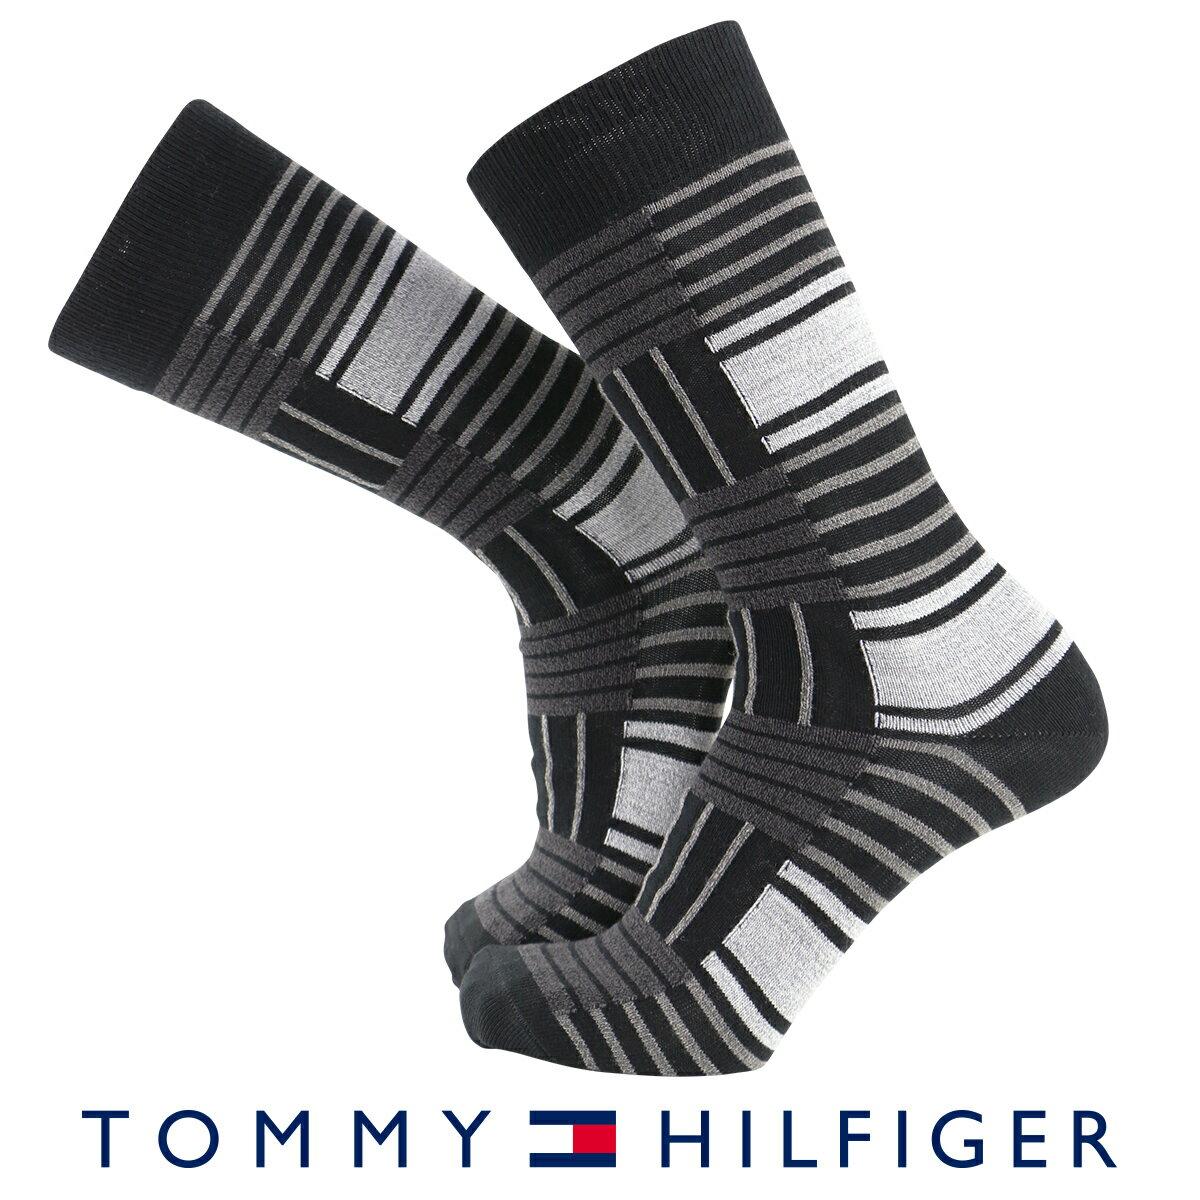 TOMMY HILFIGER トミーヒルフィガー...の商品画像